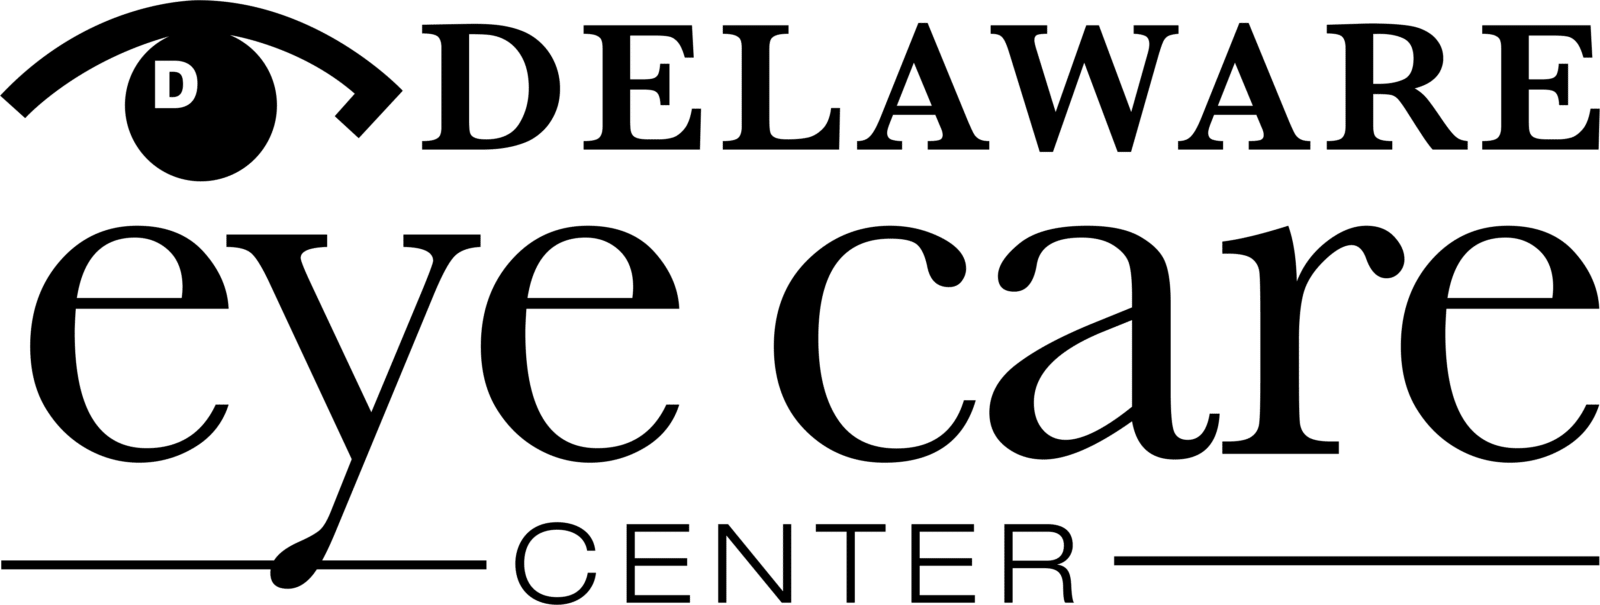 Delaware Eye Care